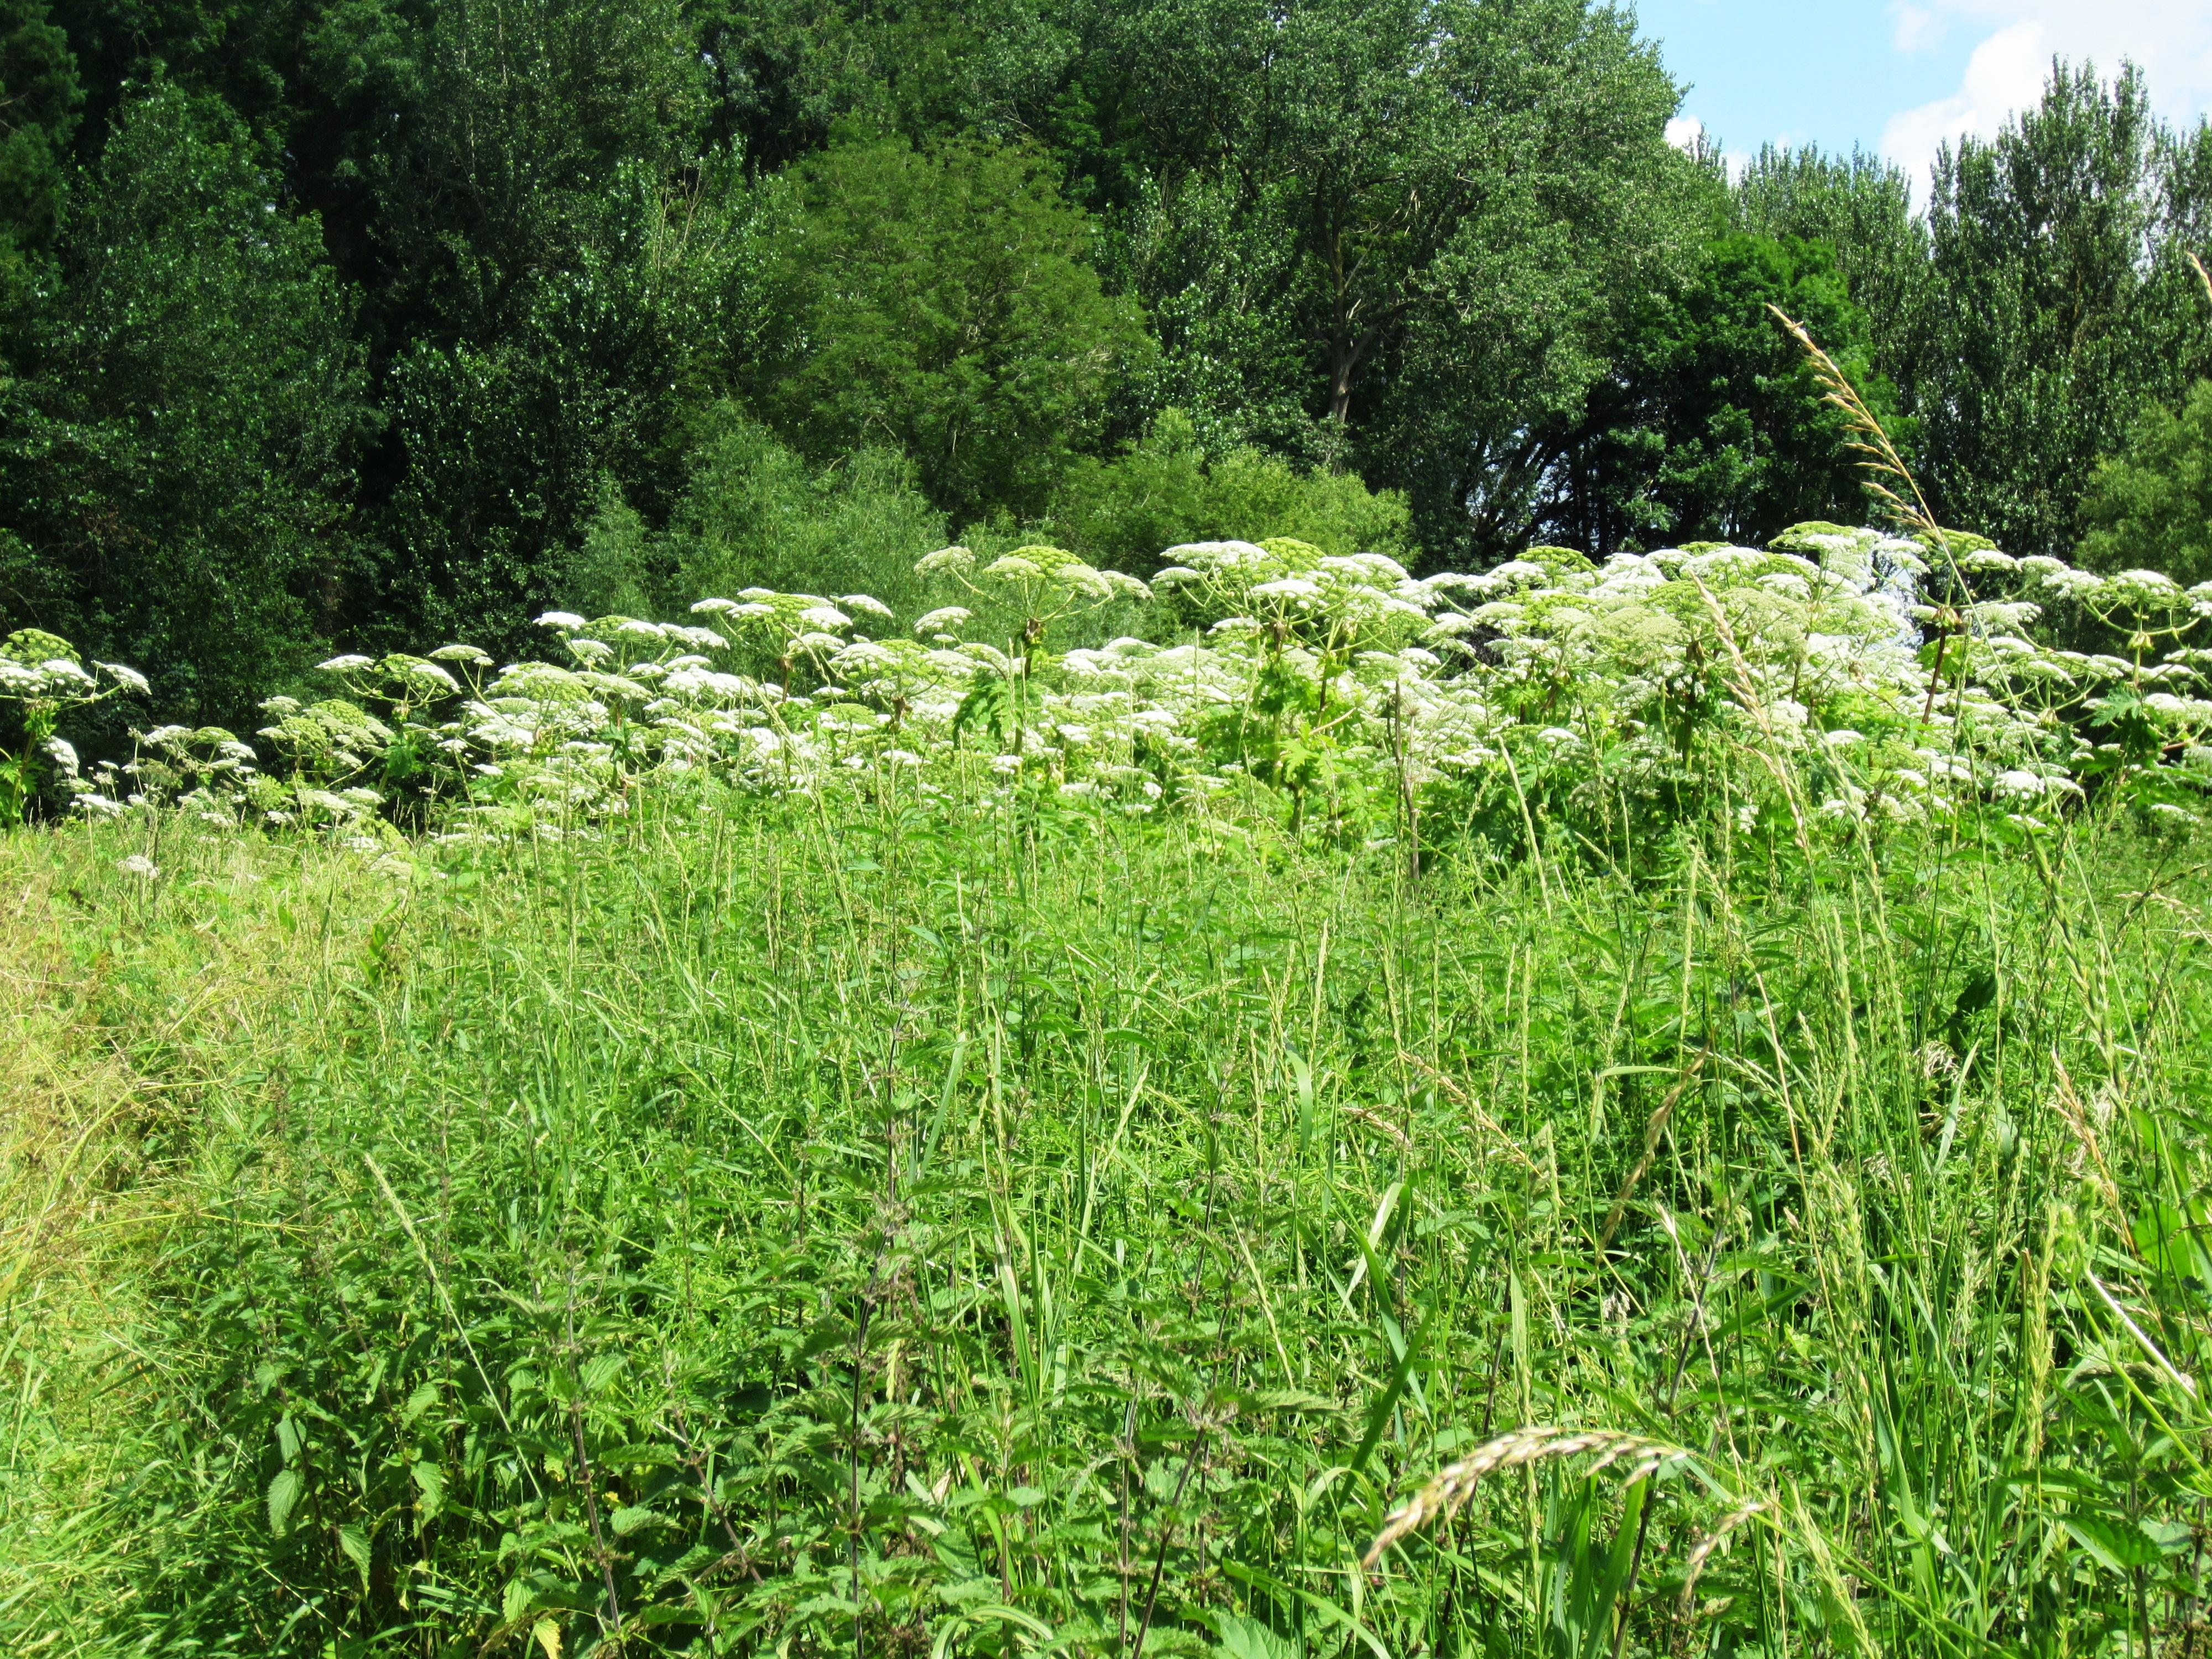 2021-07-08 Giant Hogweed 01